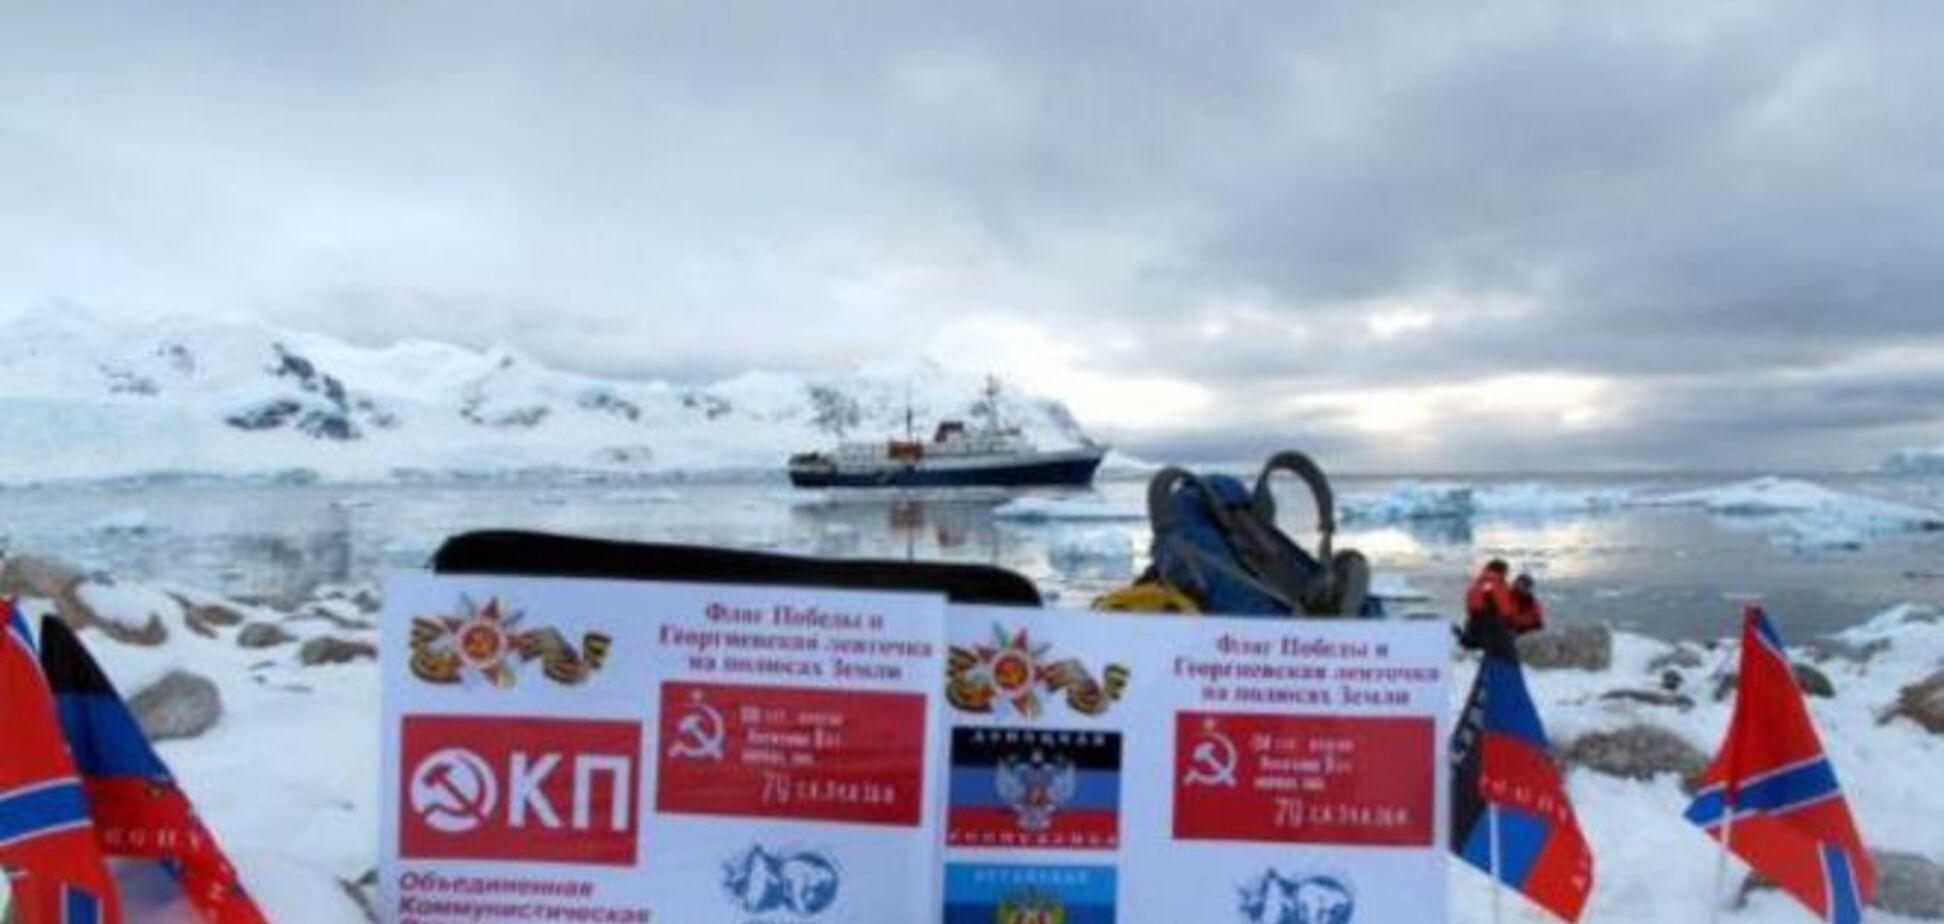 Пингвины, остерегайтесь! Над Антарктидой подняли флаги боевиков 'ДНР': фотофакт